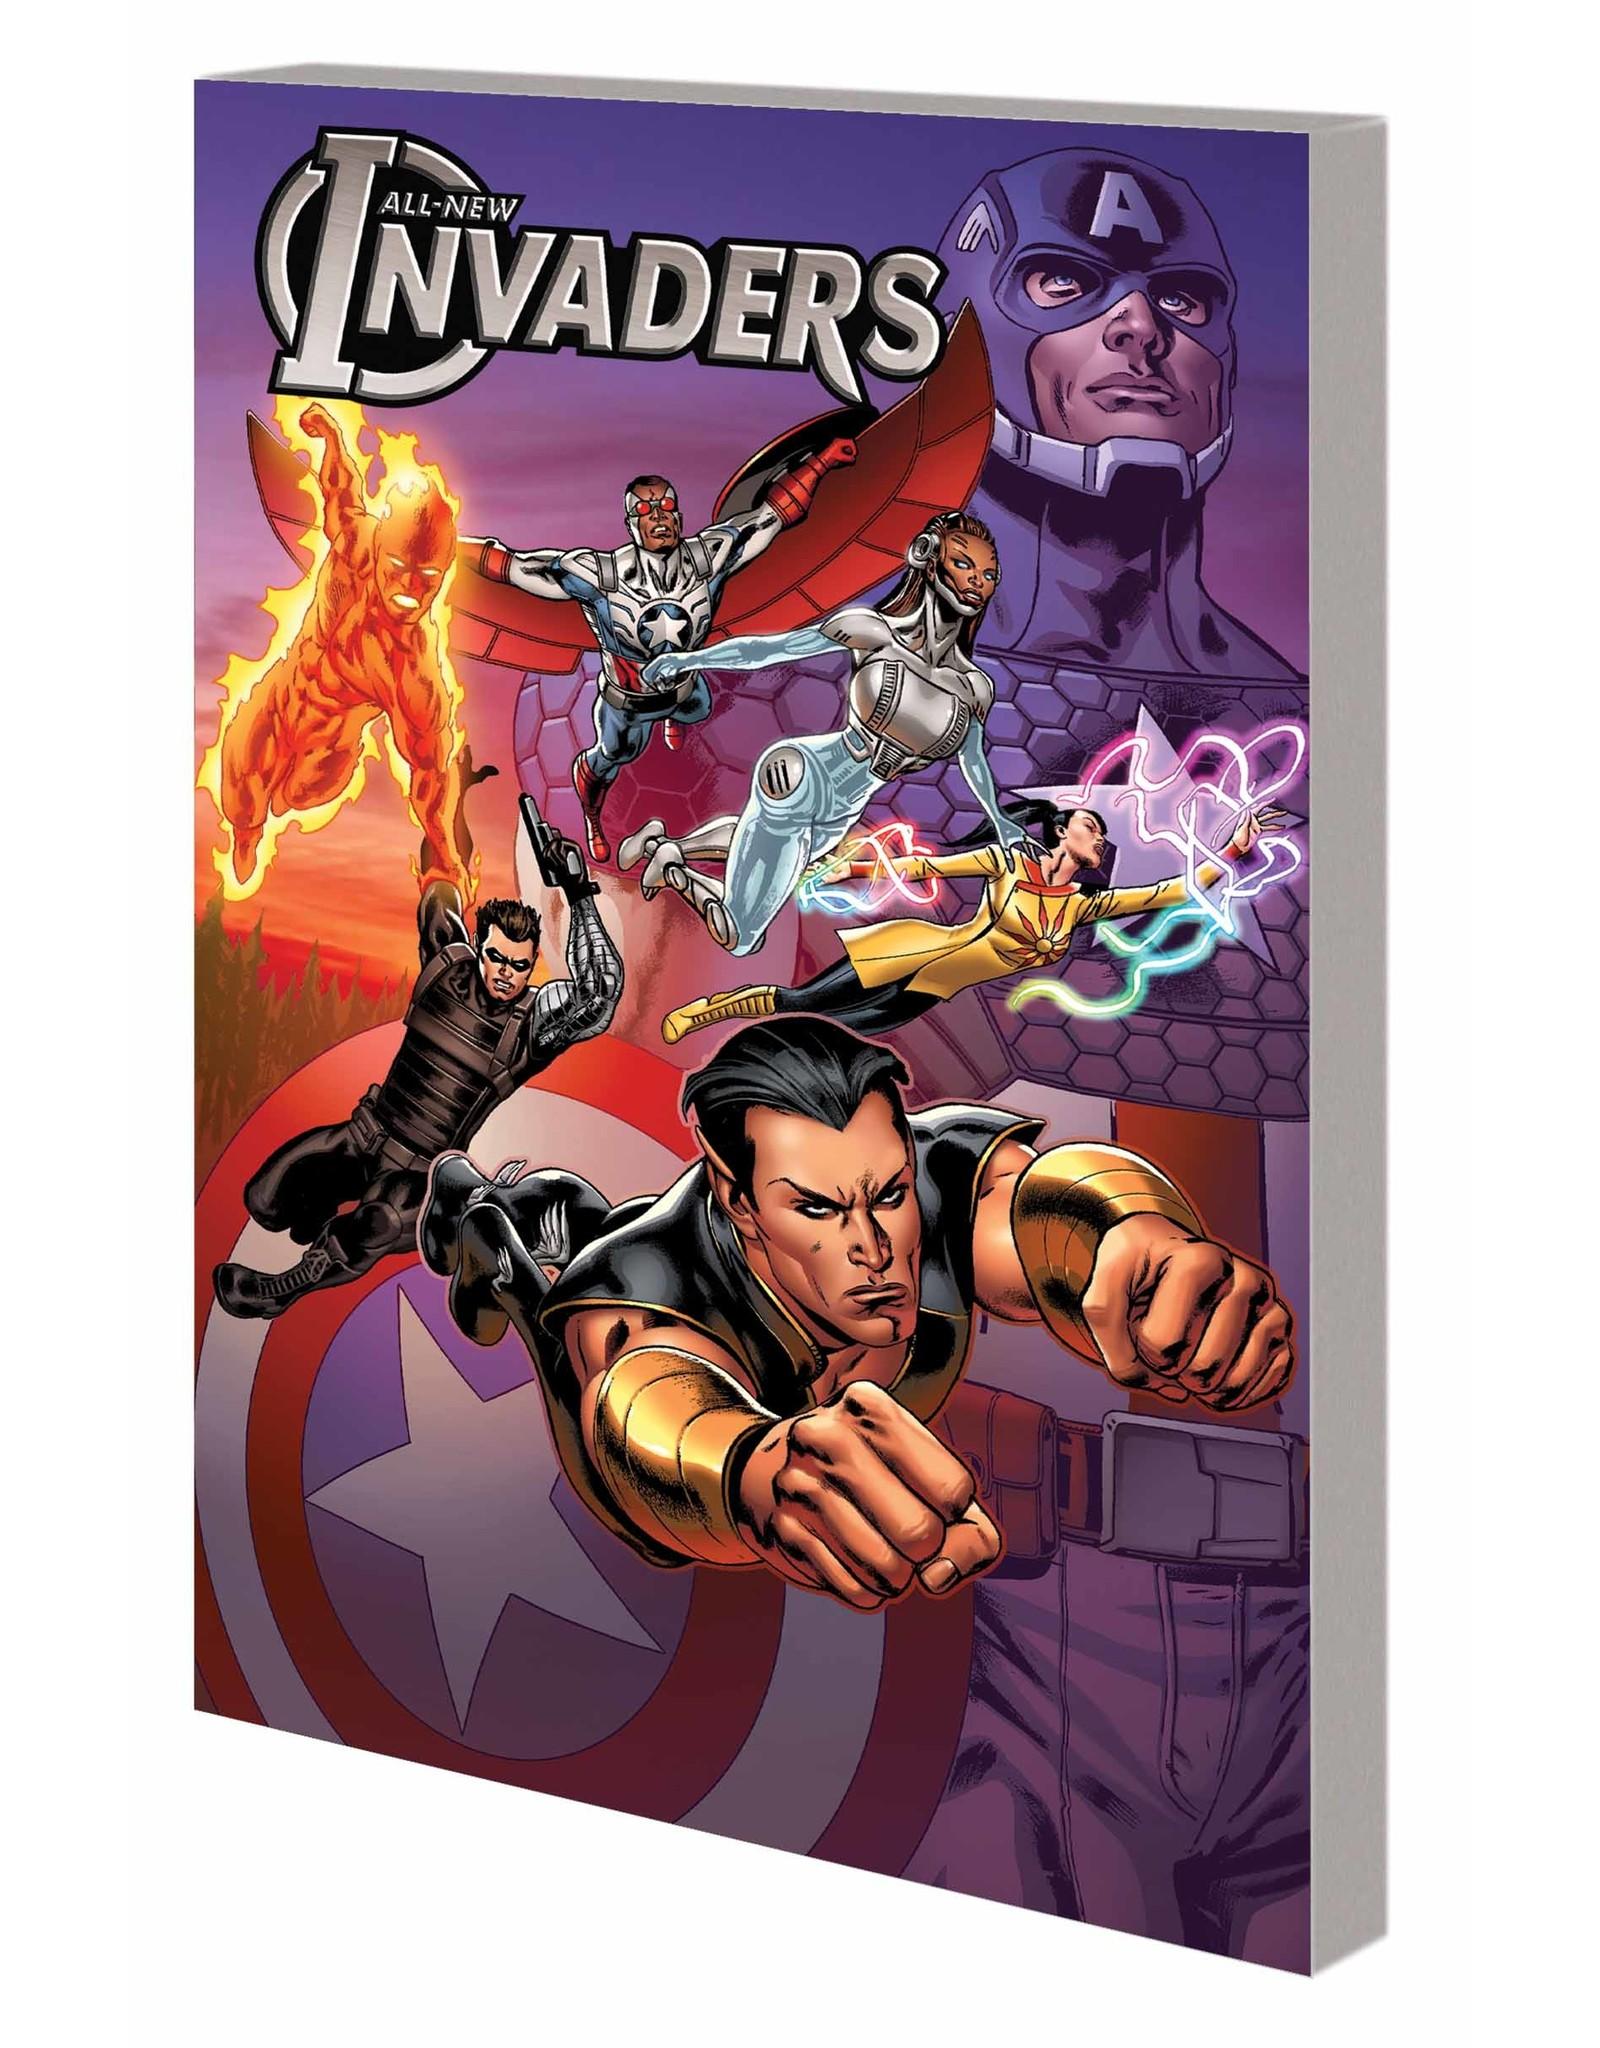 MARVEL COMICS ALL NEW INVADERS TP VOL 03 MARTIANS ARE COMING